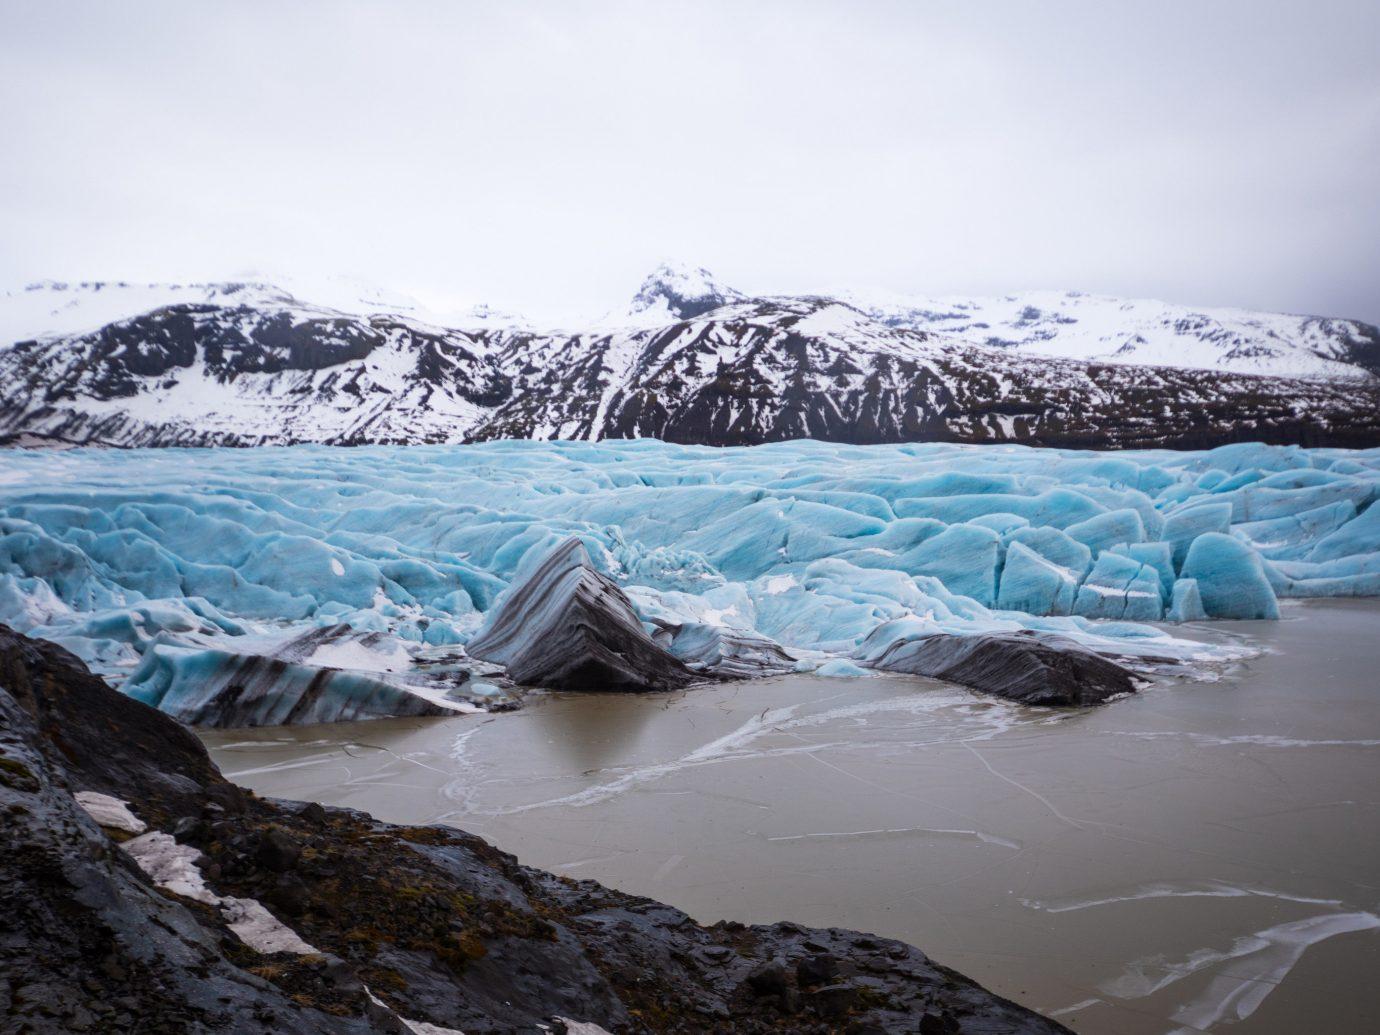 Iceland Outdoors + Adventure Road Trips glacial lake water glacier glacial landform ice cap ice arctic iceberg mountain polar ice cap sea ice fell nunatak fjord arctic ocean cirque freezing Lake melting landscape moraine sky